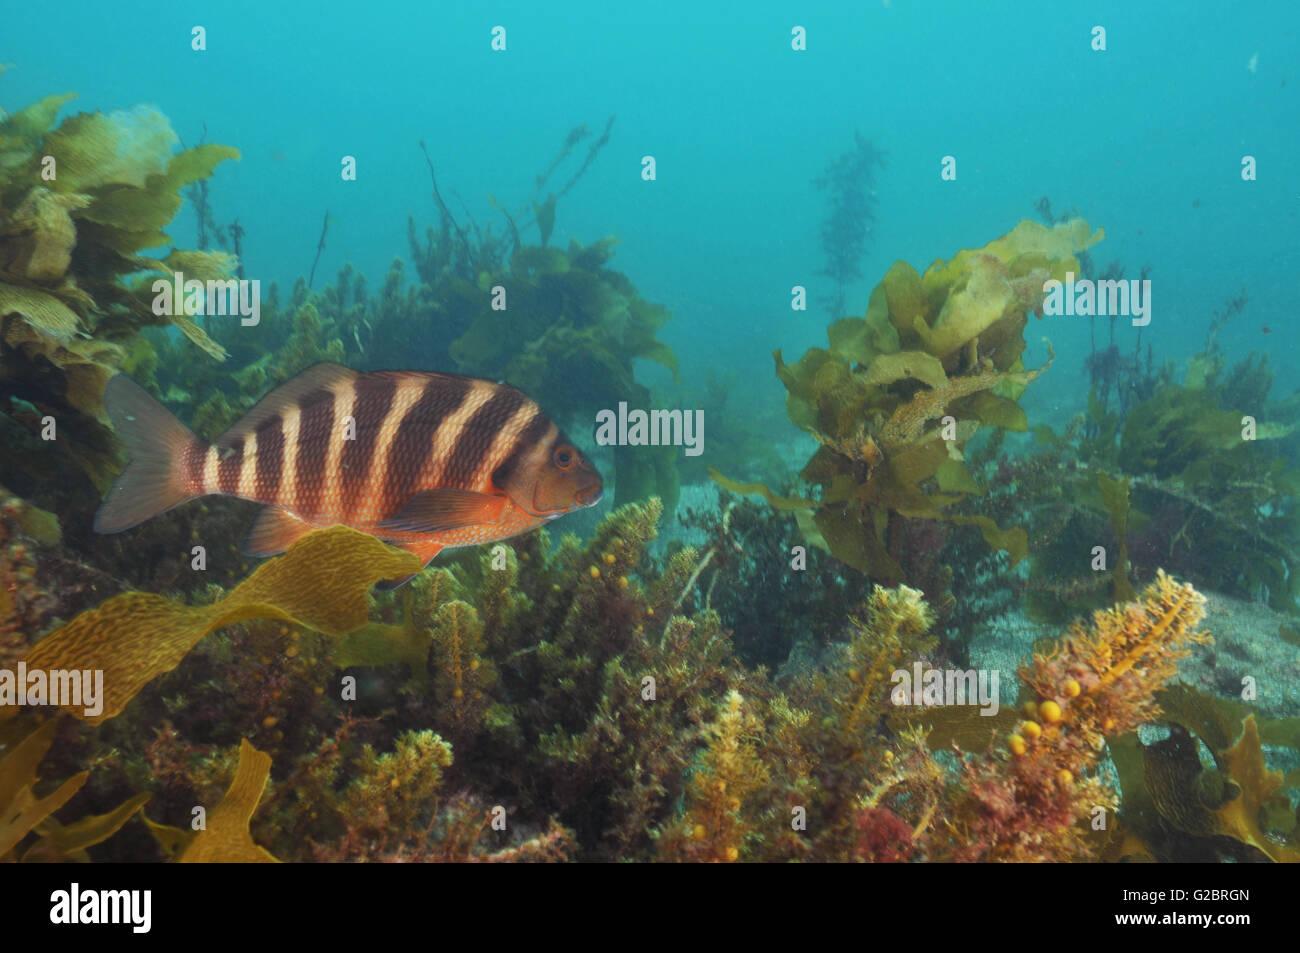 Red moki among seaweeds - Stock Image